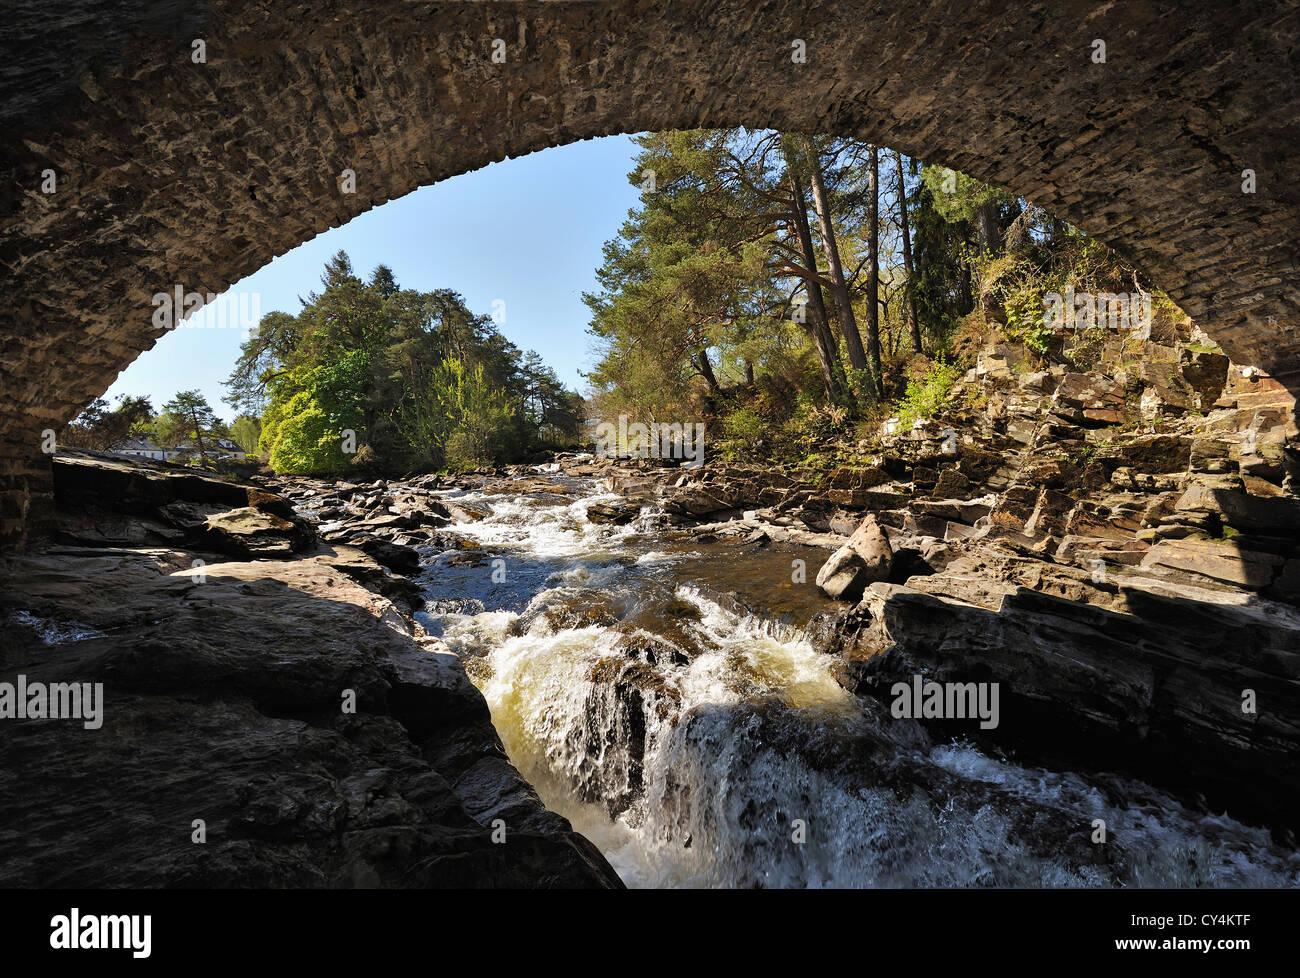 Below the arches of the bridge at the Falls of Dochart, Killin, Perthshire, Scotland, UK - Stock Image